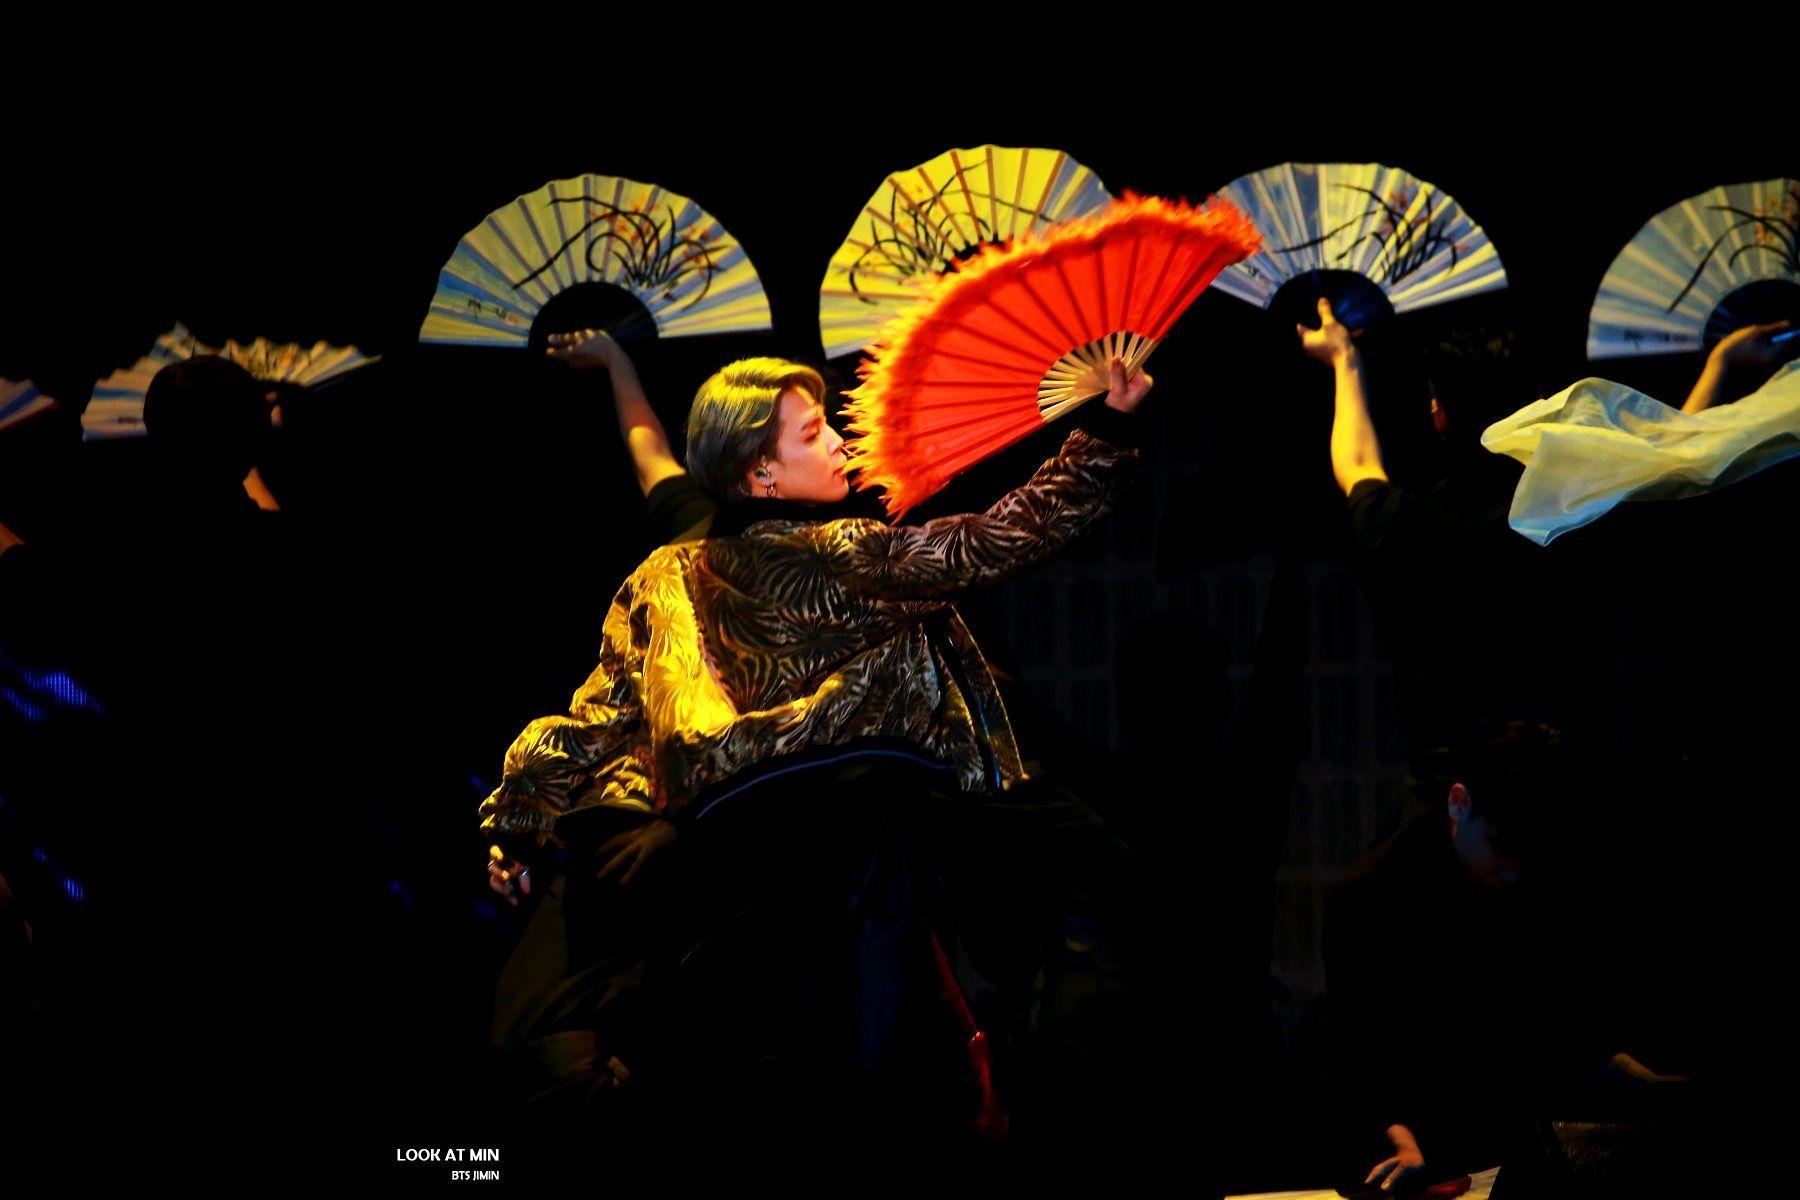 Jimin Melon Music Awards 181201 Bts Idol Bts Jimin Park Jimin Jimin